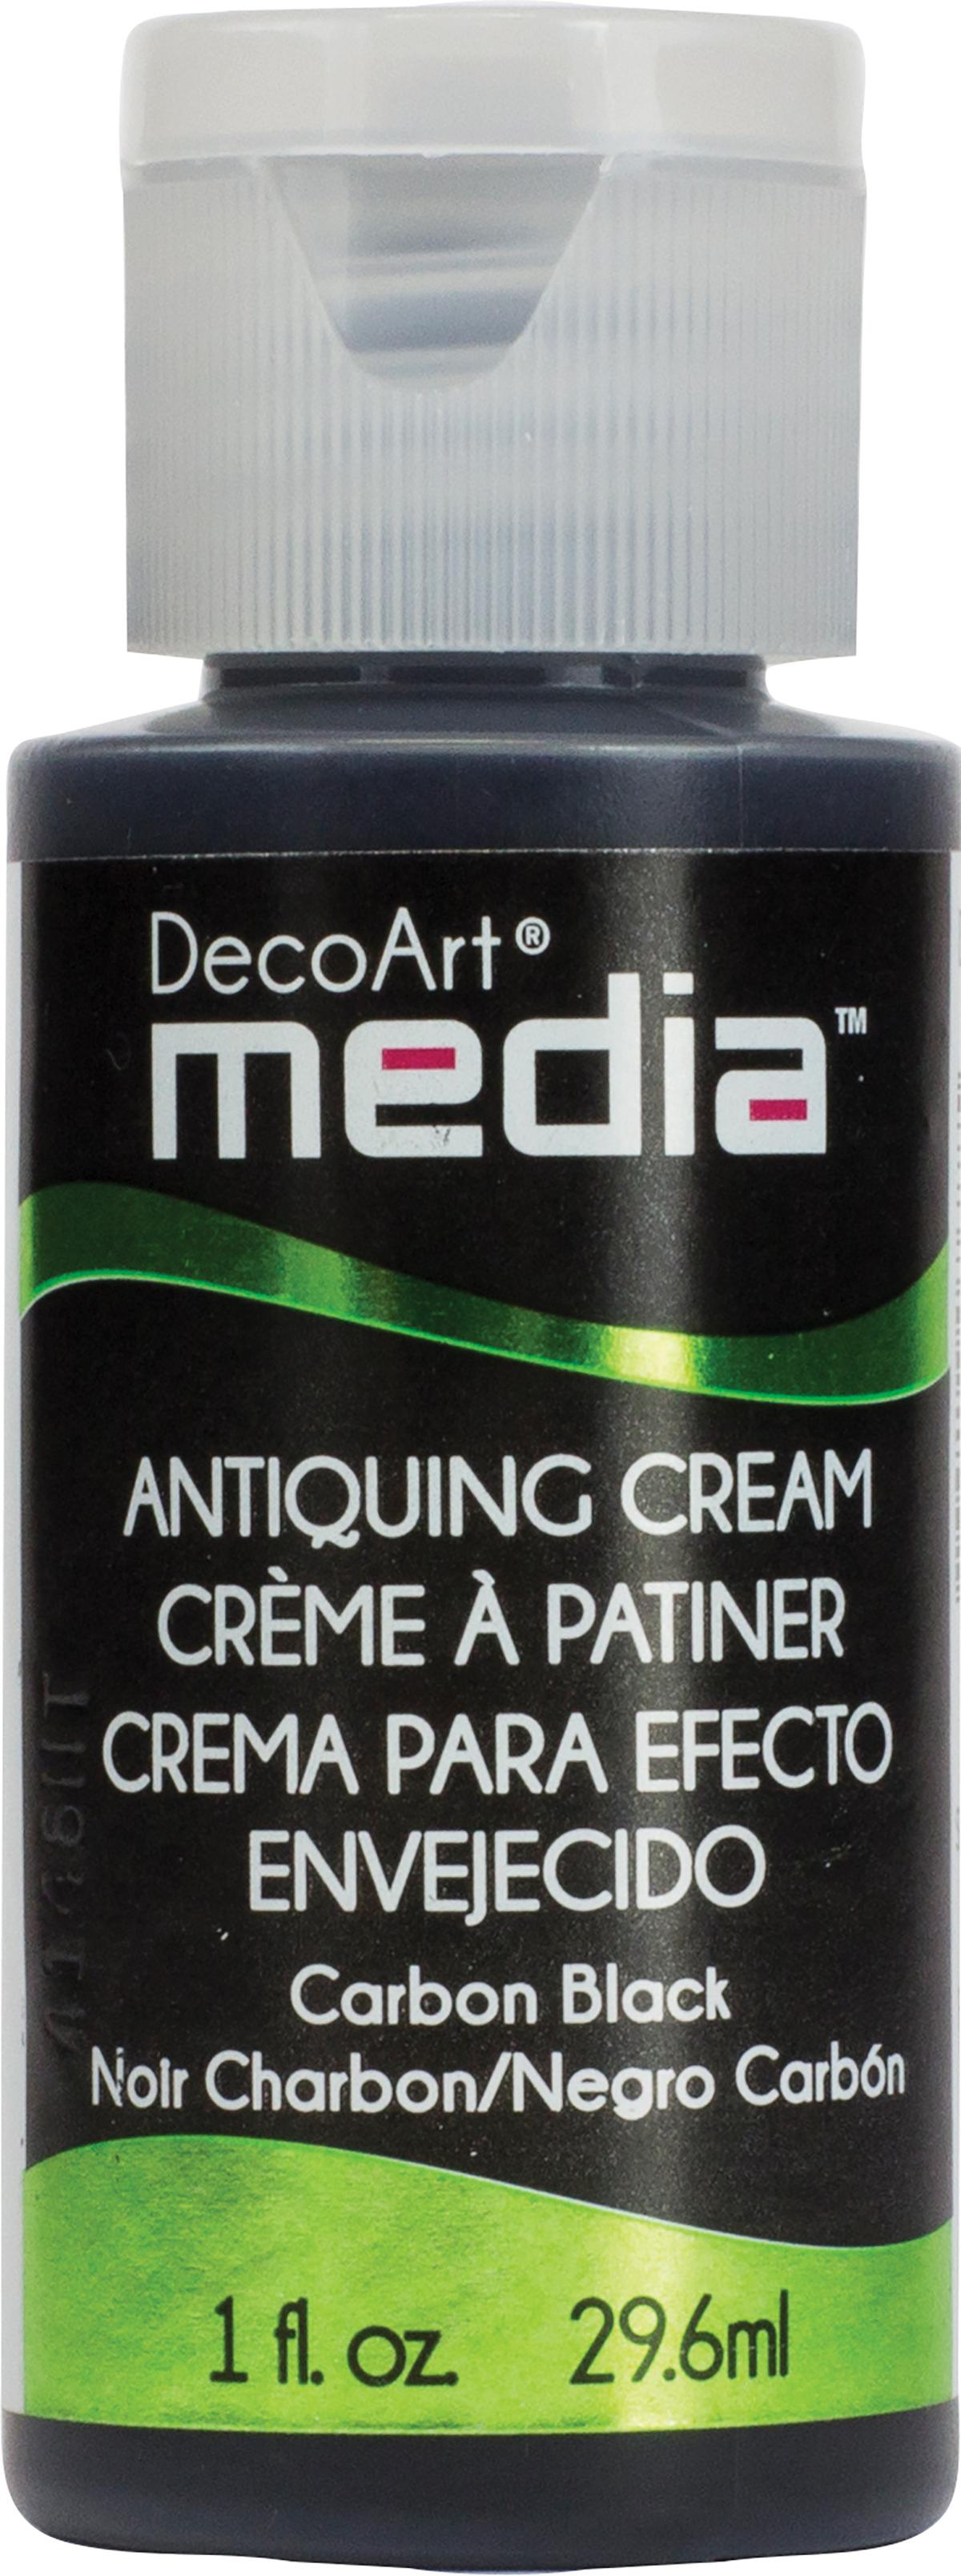 DecoArt Media Antiquing Cream 1oz-Carbon Black